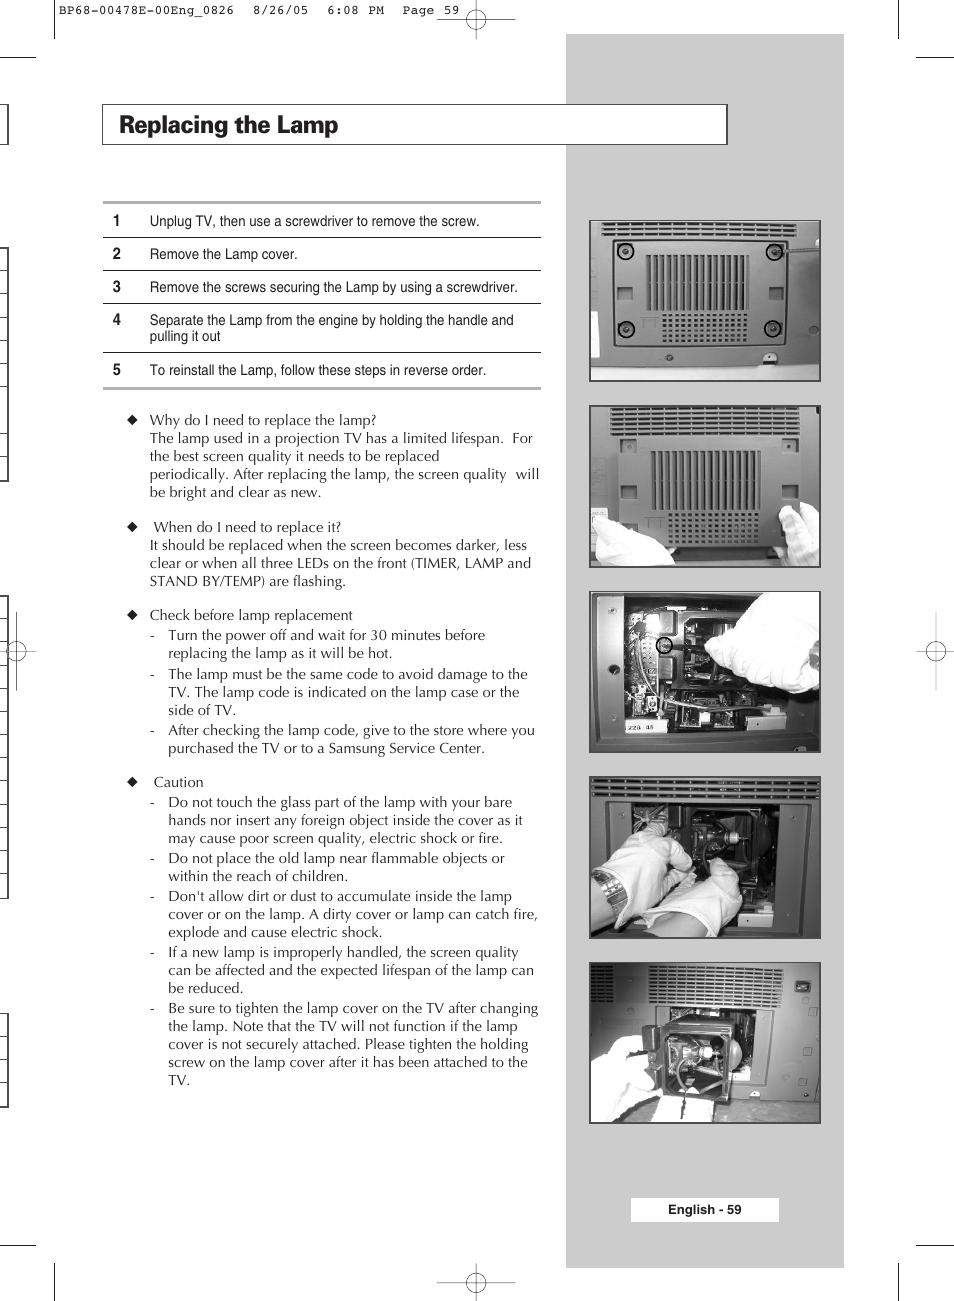 replacing the lamp samsung dlp tv sp46l6hx user manual page 59 rh manualsdir com Samsung TV Manual Model LN46A530P1F Samsung 6000 LED TV Manual